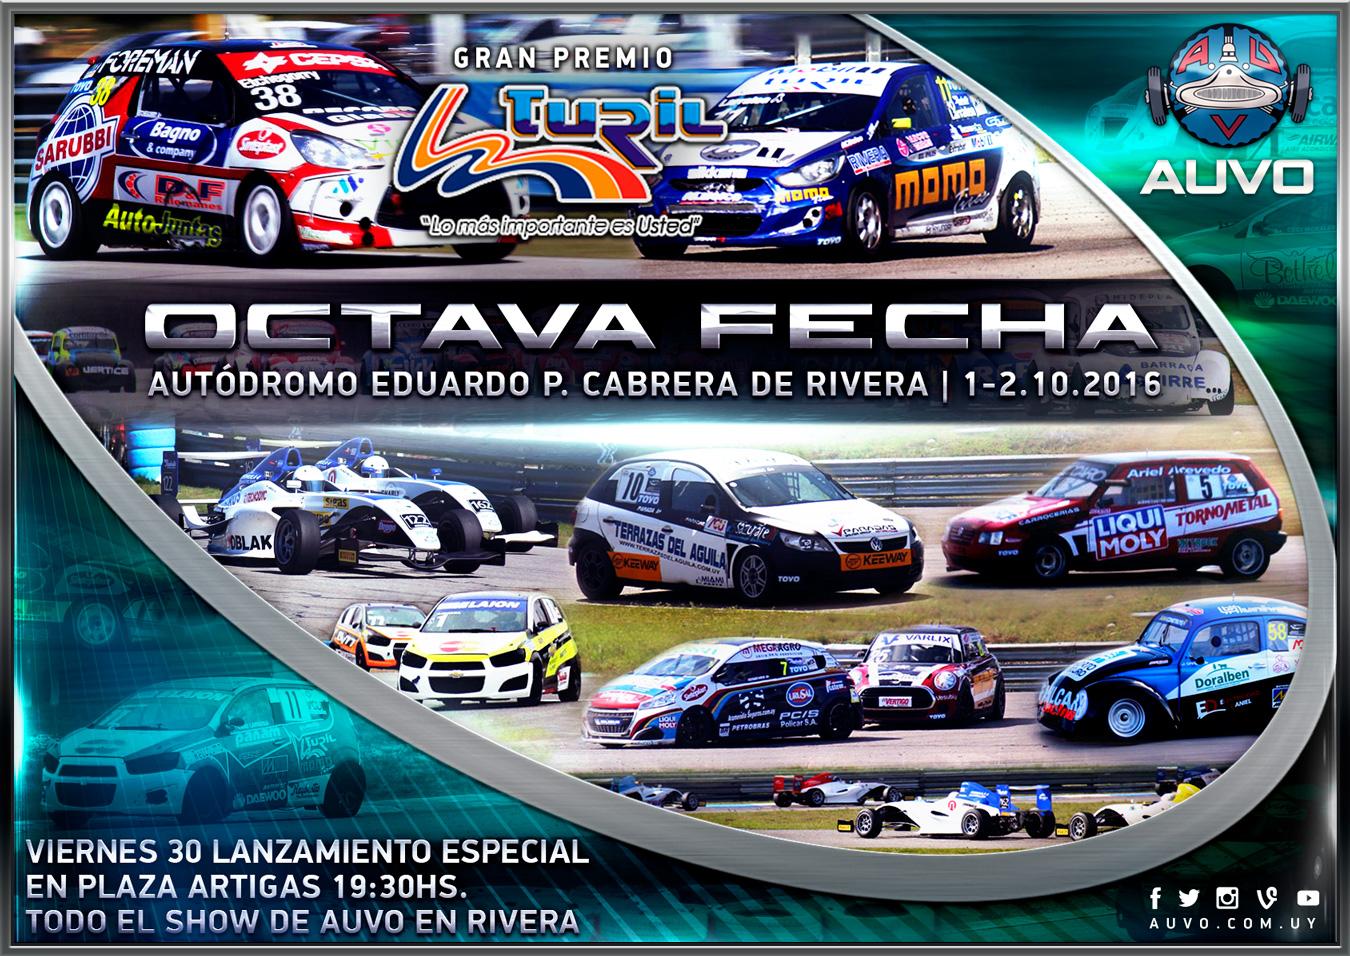 afiche-octava-fecha-rivera-sin-sponsors-para-web